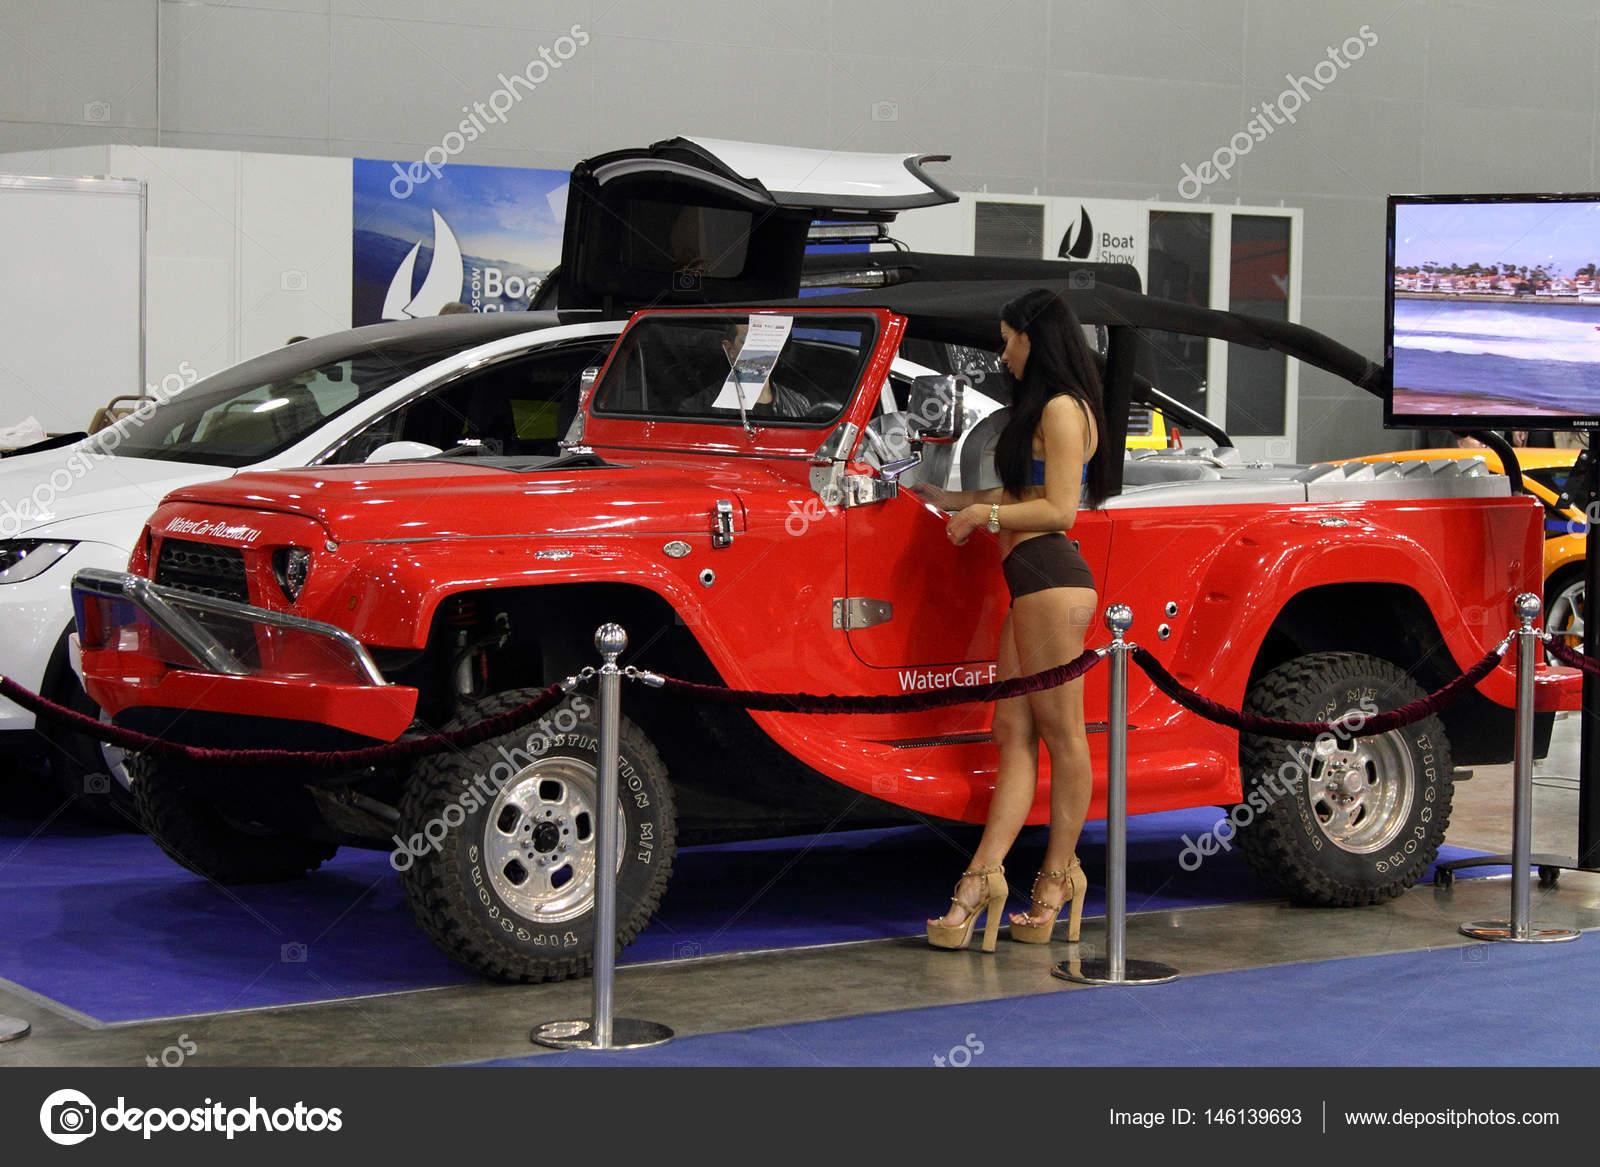 Москва - 09 марта 2017  Пантера Watercar для 10 международное бот-шоу в  Москве. Россия — Фото автора kamski 3174b0efa46